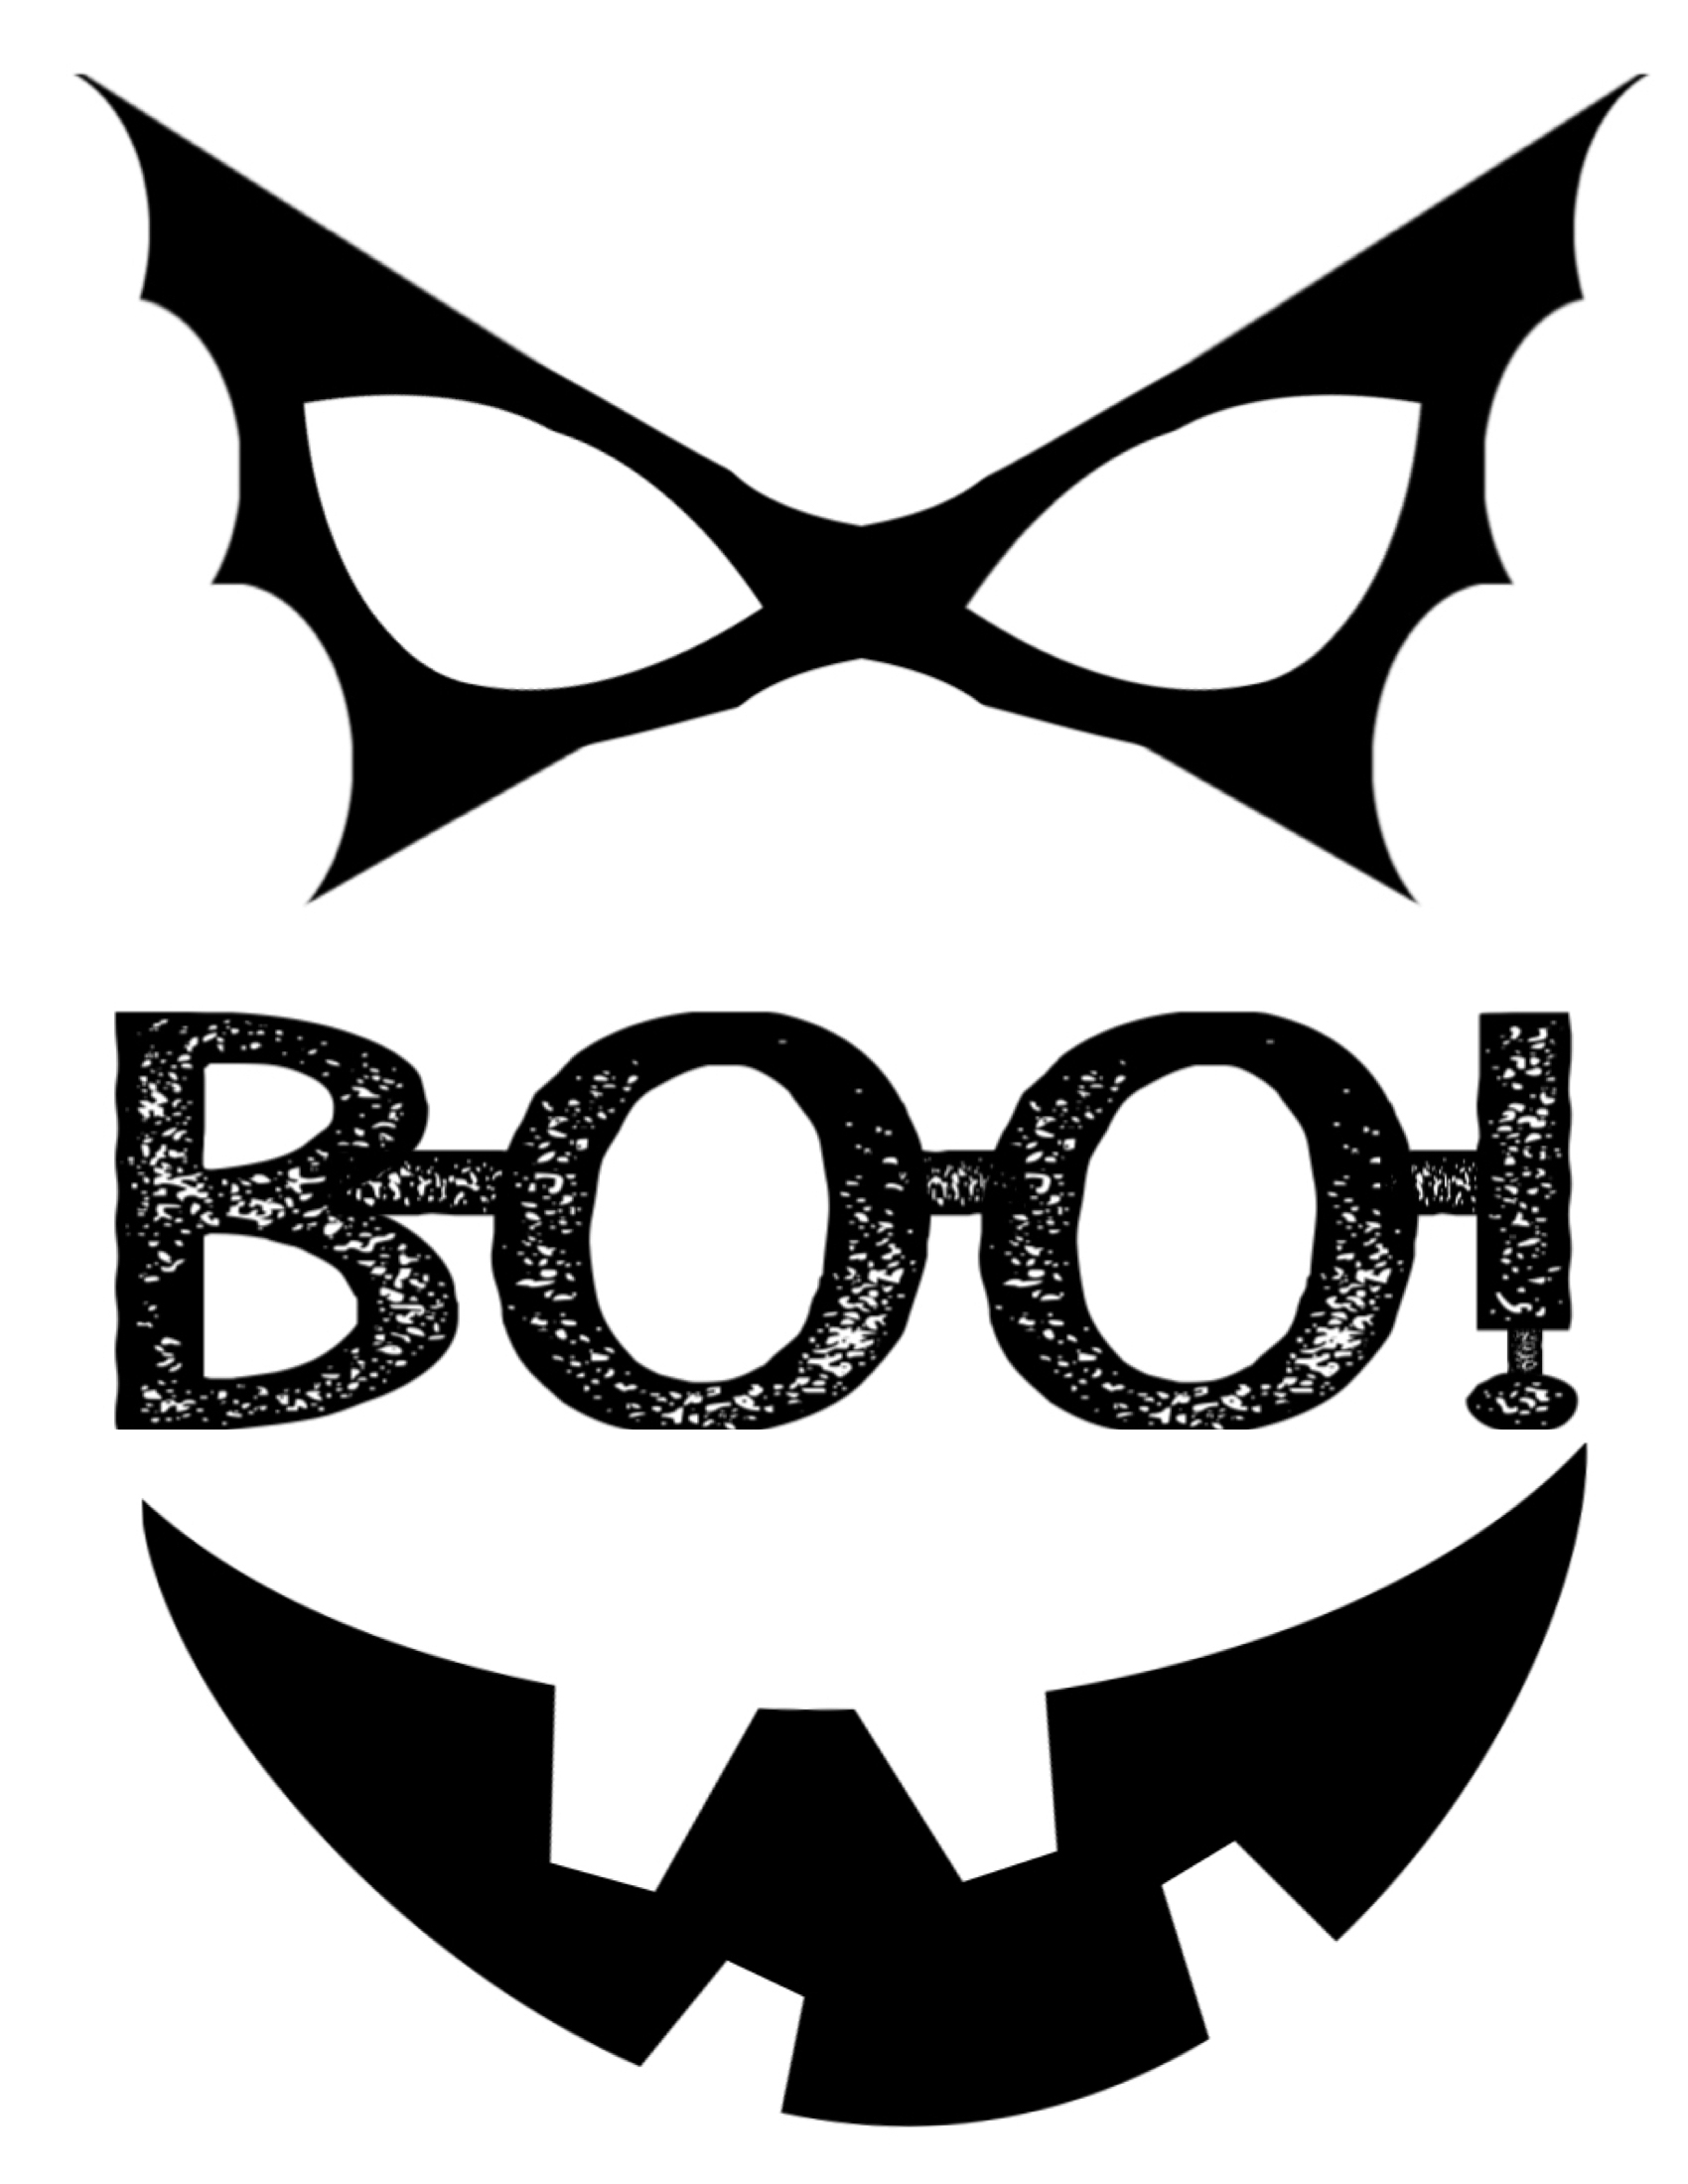 Halloween Photo Booth Props Printable Free Pdf Halloween Photo Booth - Free Photo Booth Props Printable Pdf